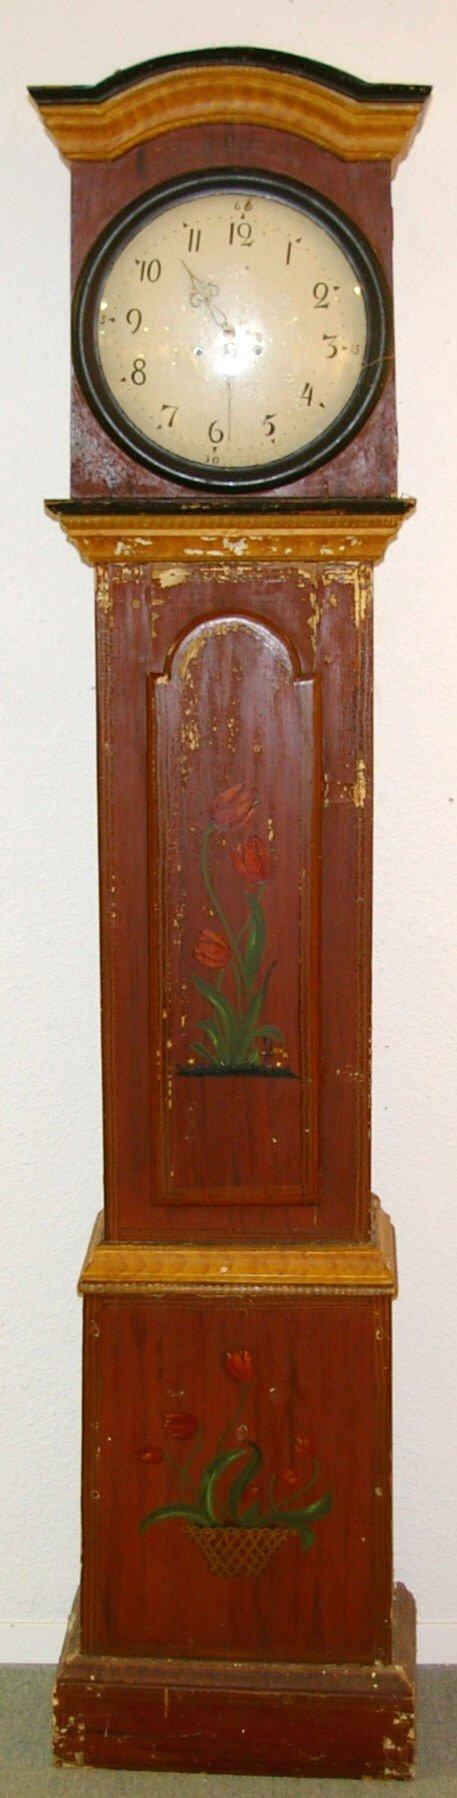 1193: Primitive Folk Art Hand Painted Grandfather Clock